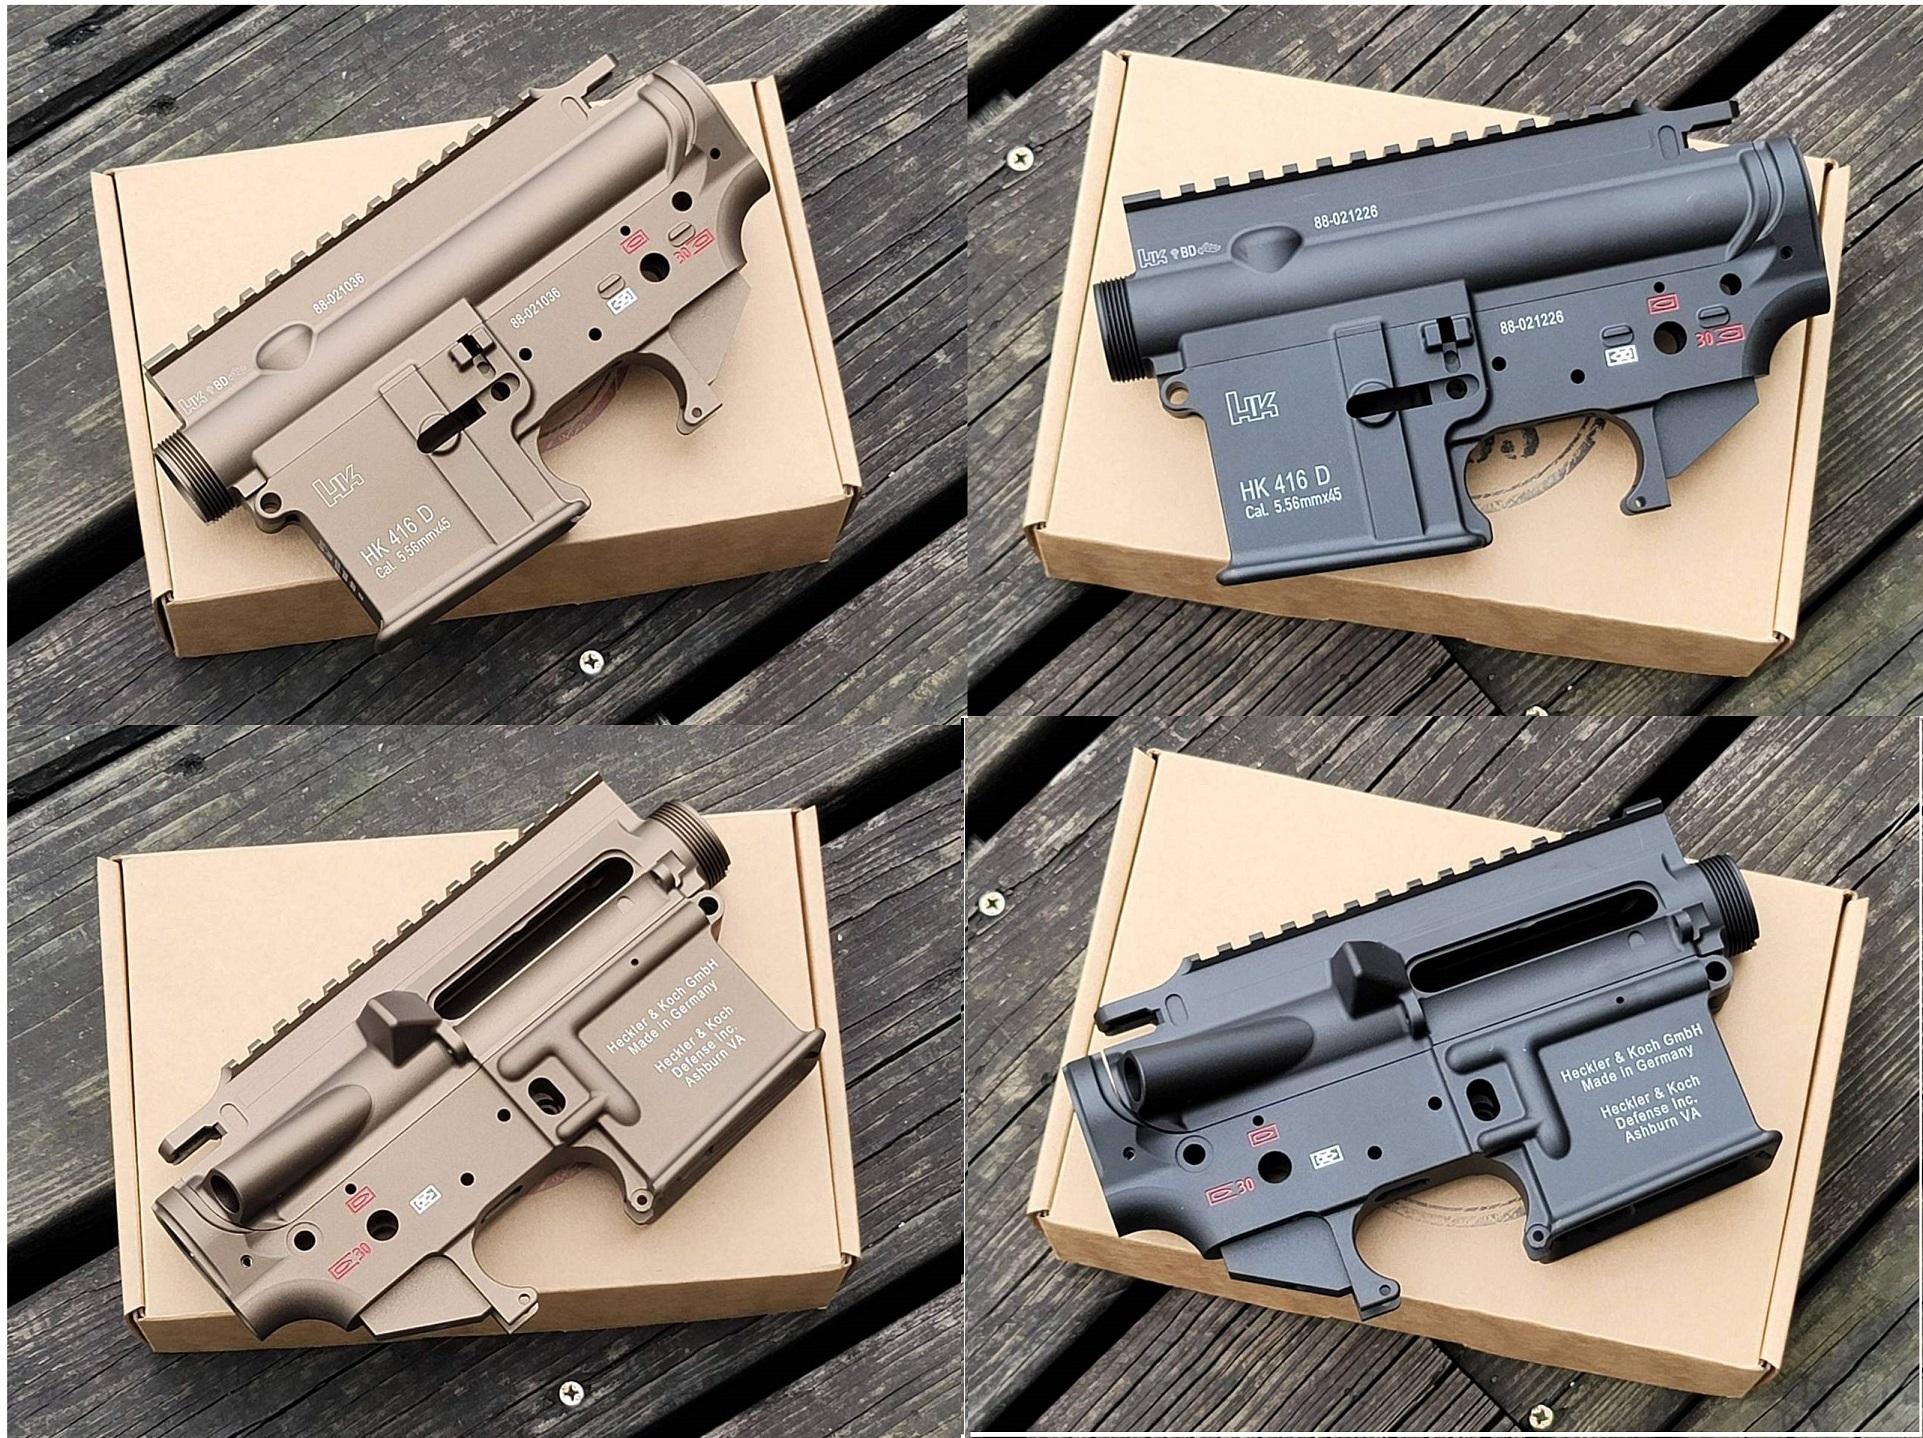 TaskForce405 HK416Dレシーバーセット/アルミCNC (Umarex/VFC HK416D Gen2用)